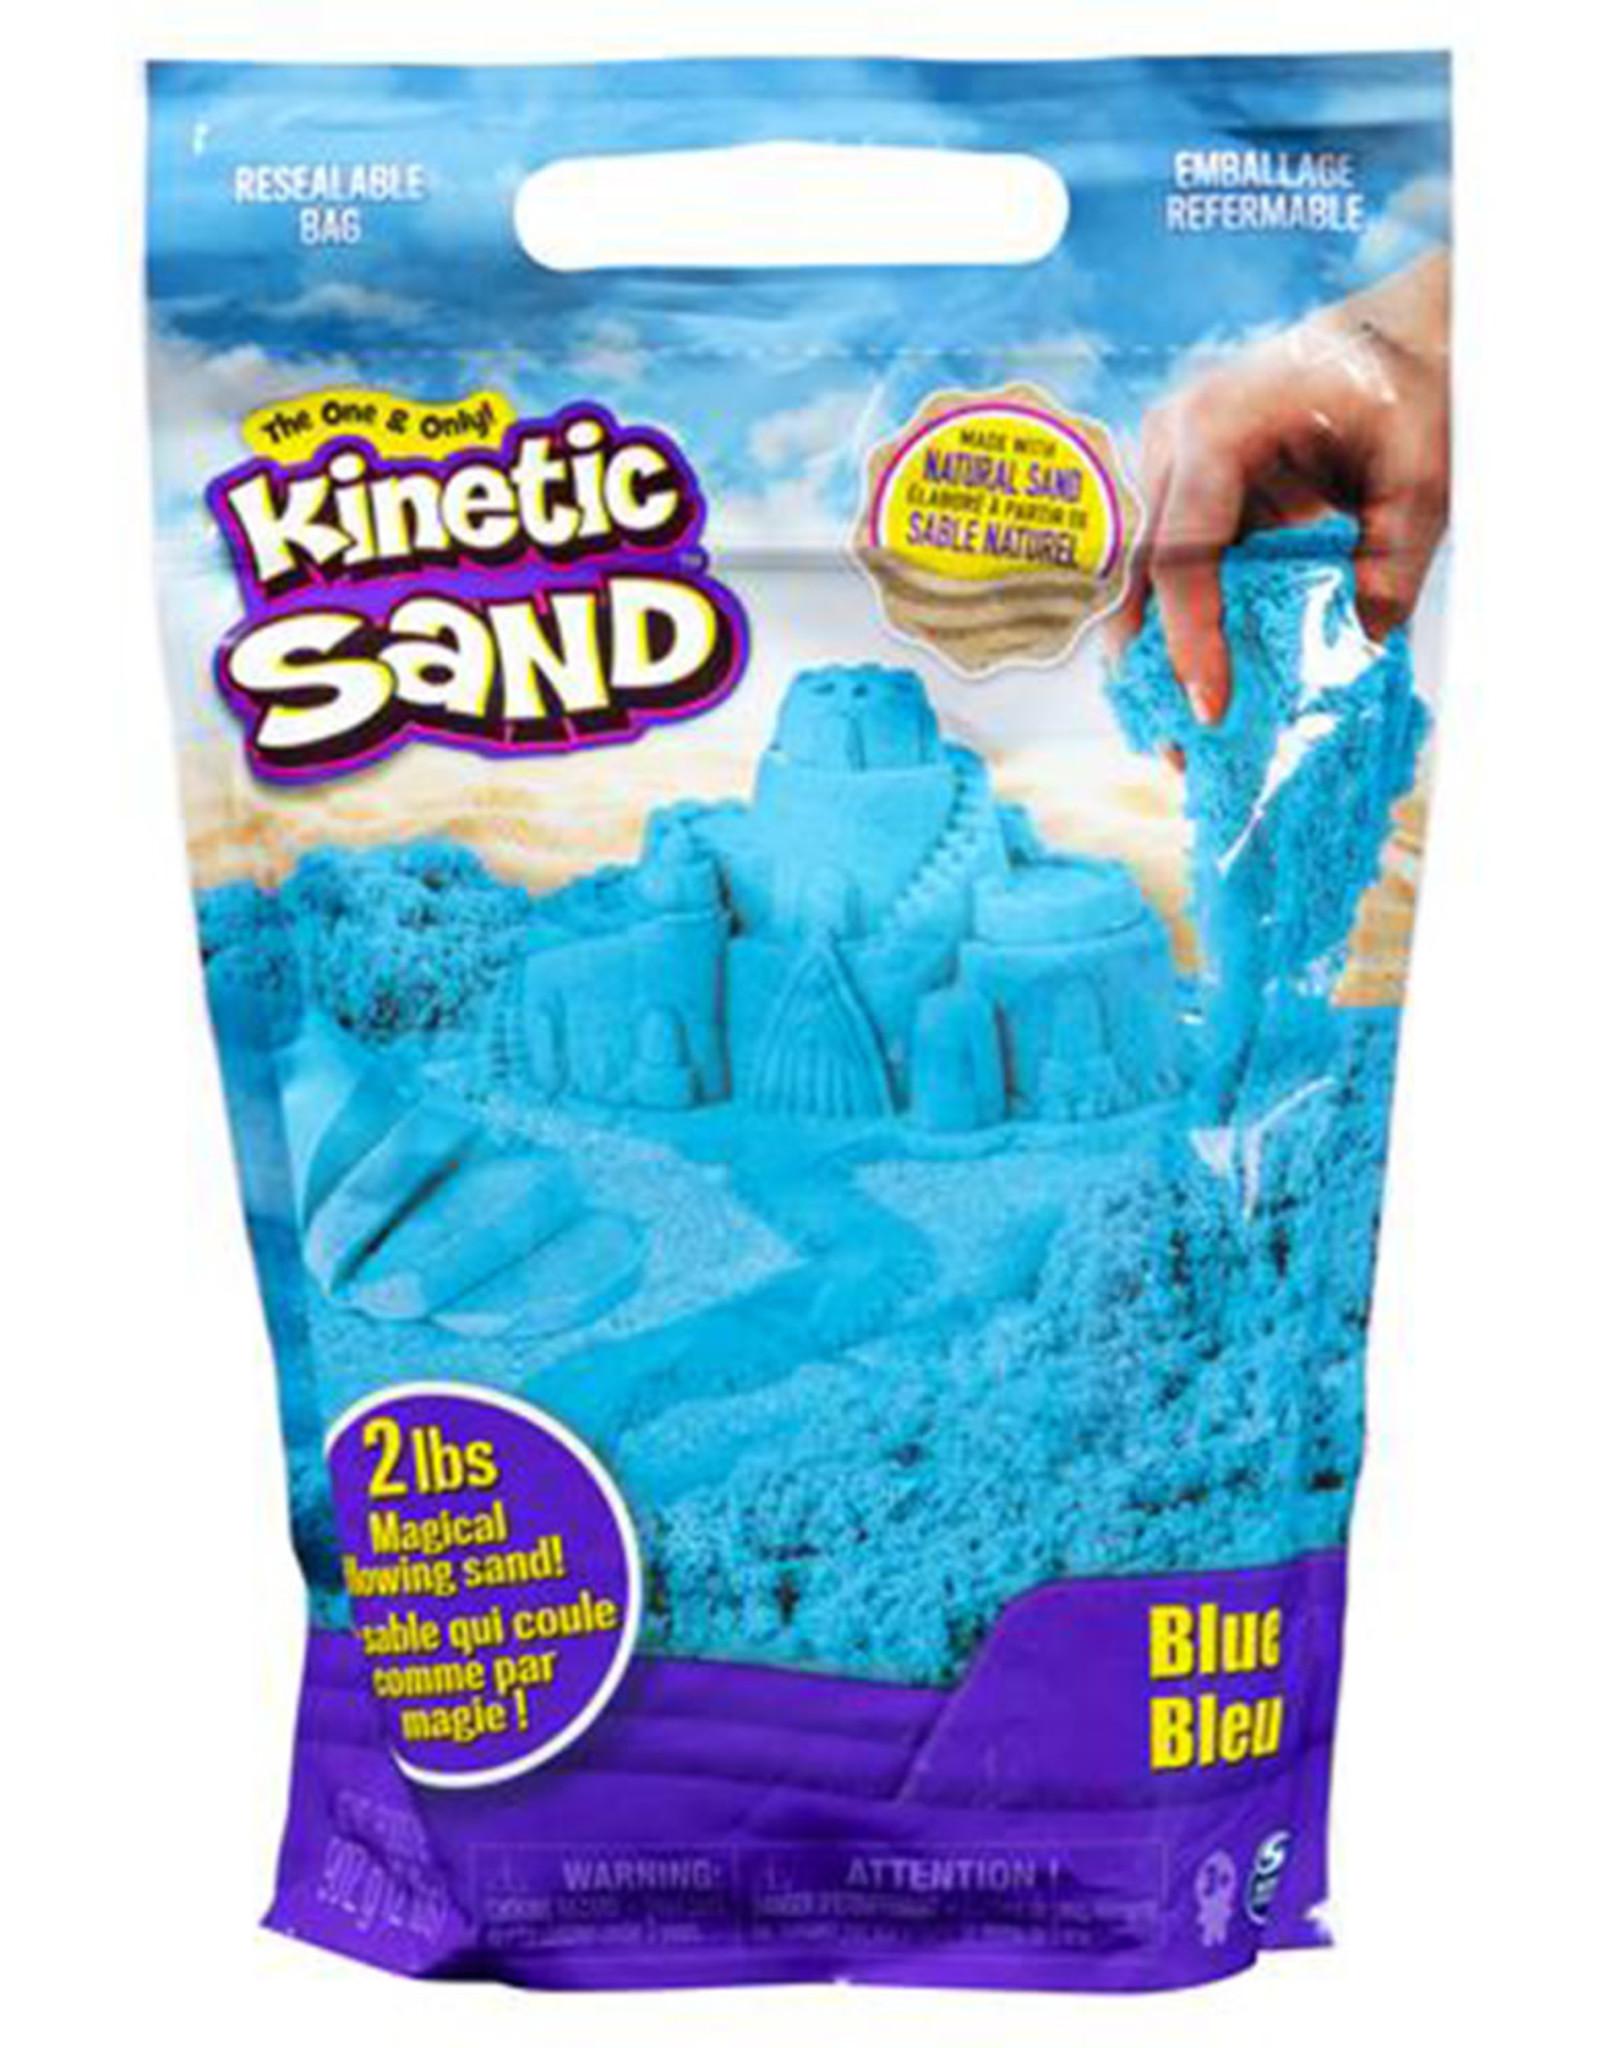 Kinetic Sand Kinetic Sand, 2 lbs - Blue